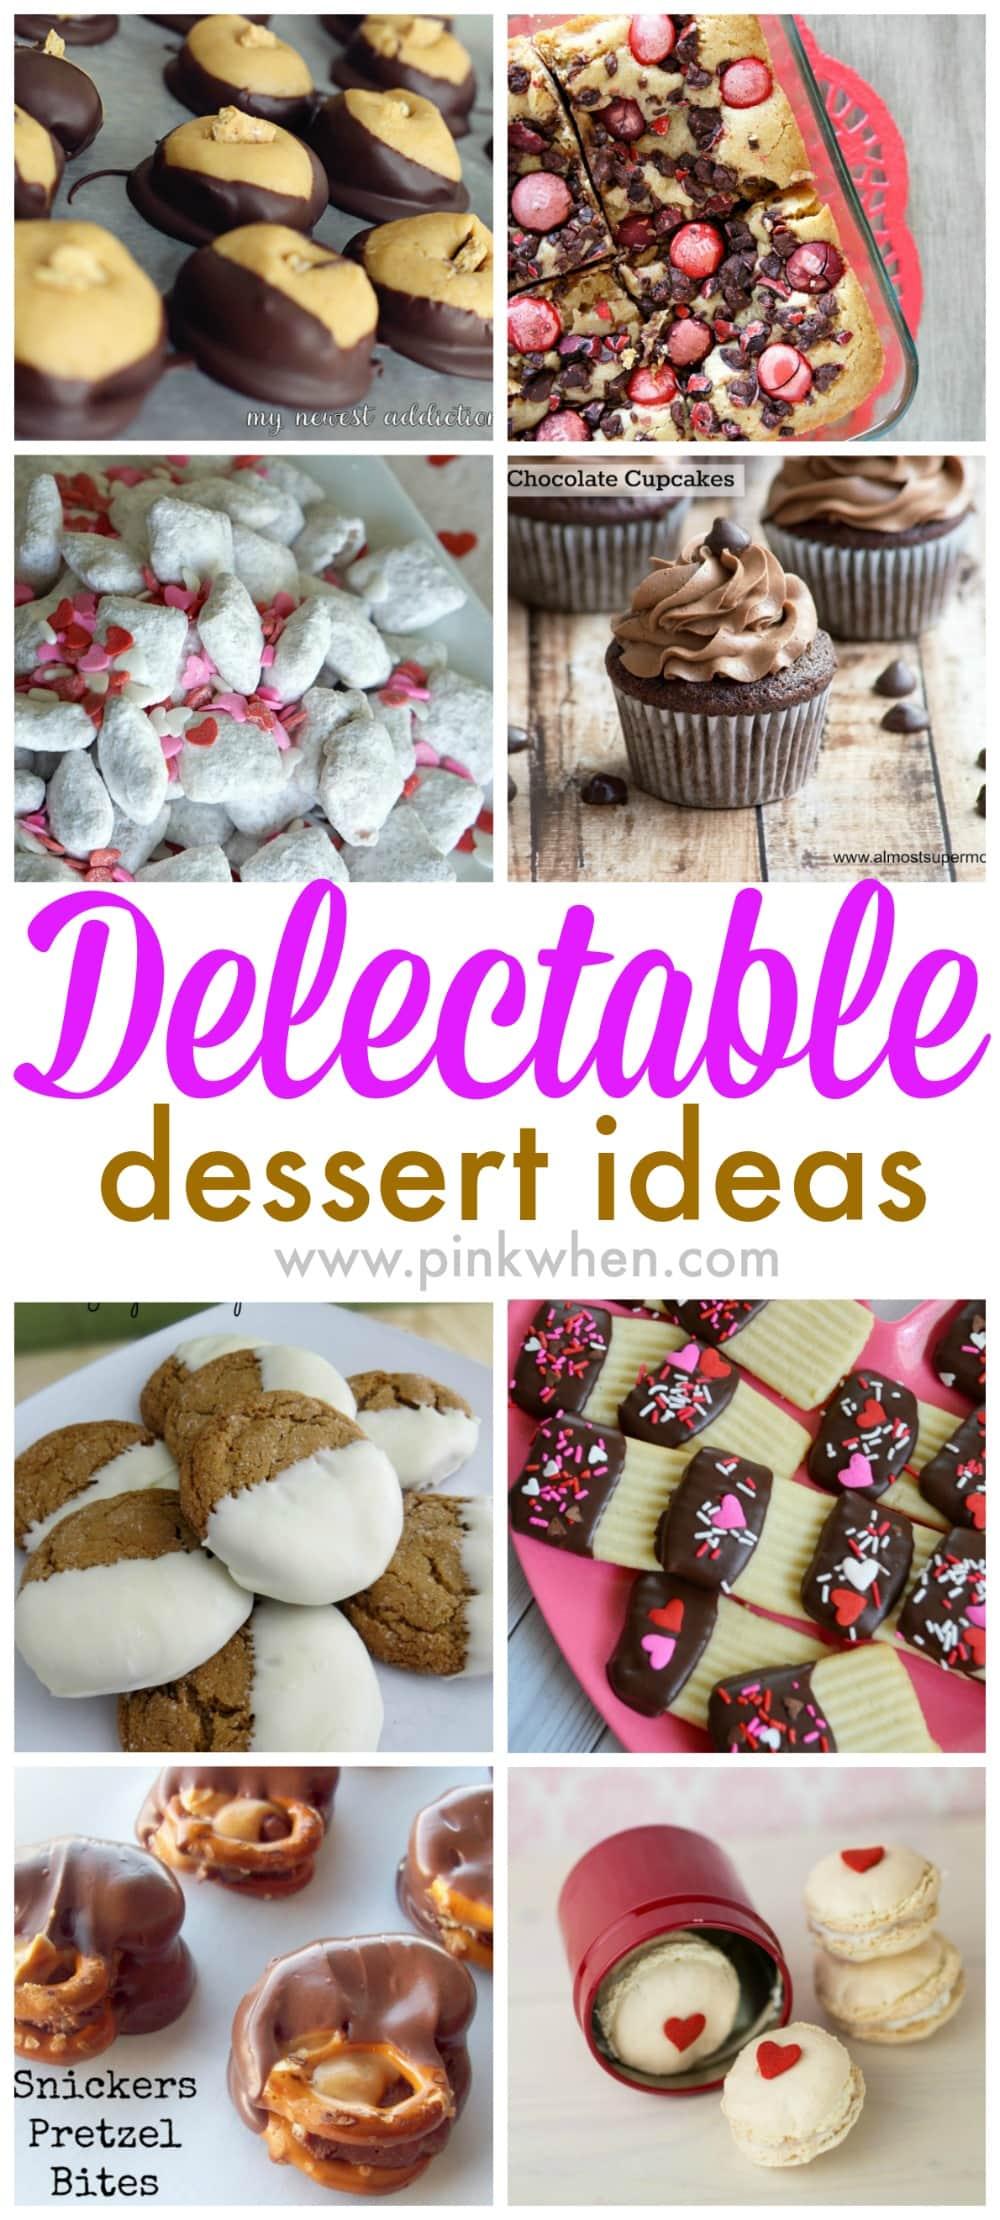 Delectable Dessert Ideas